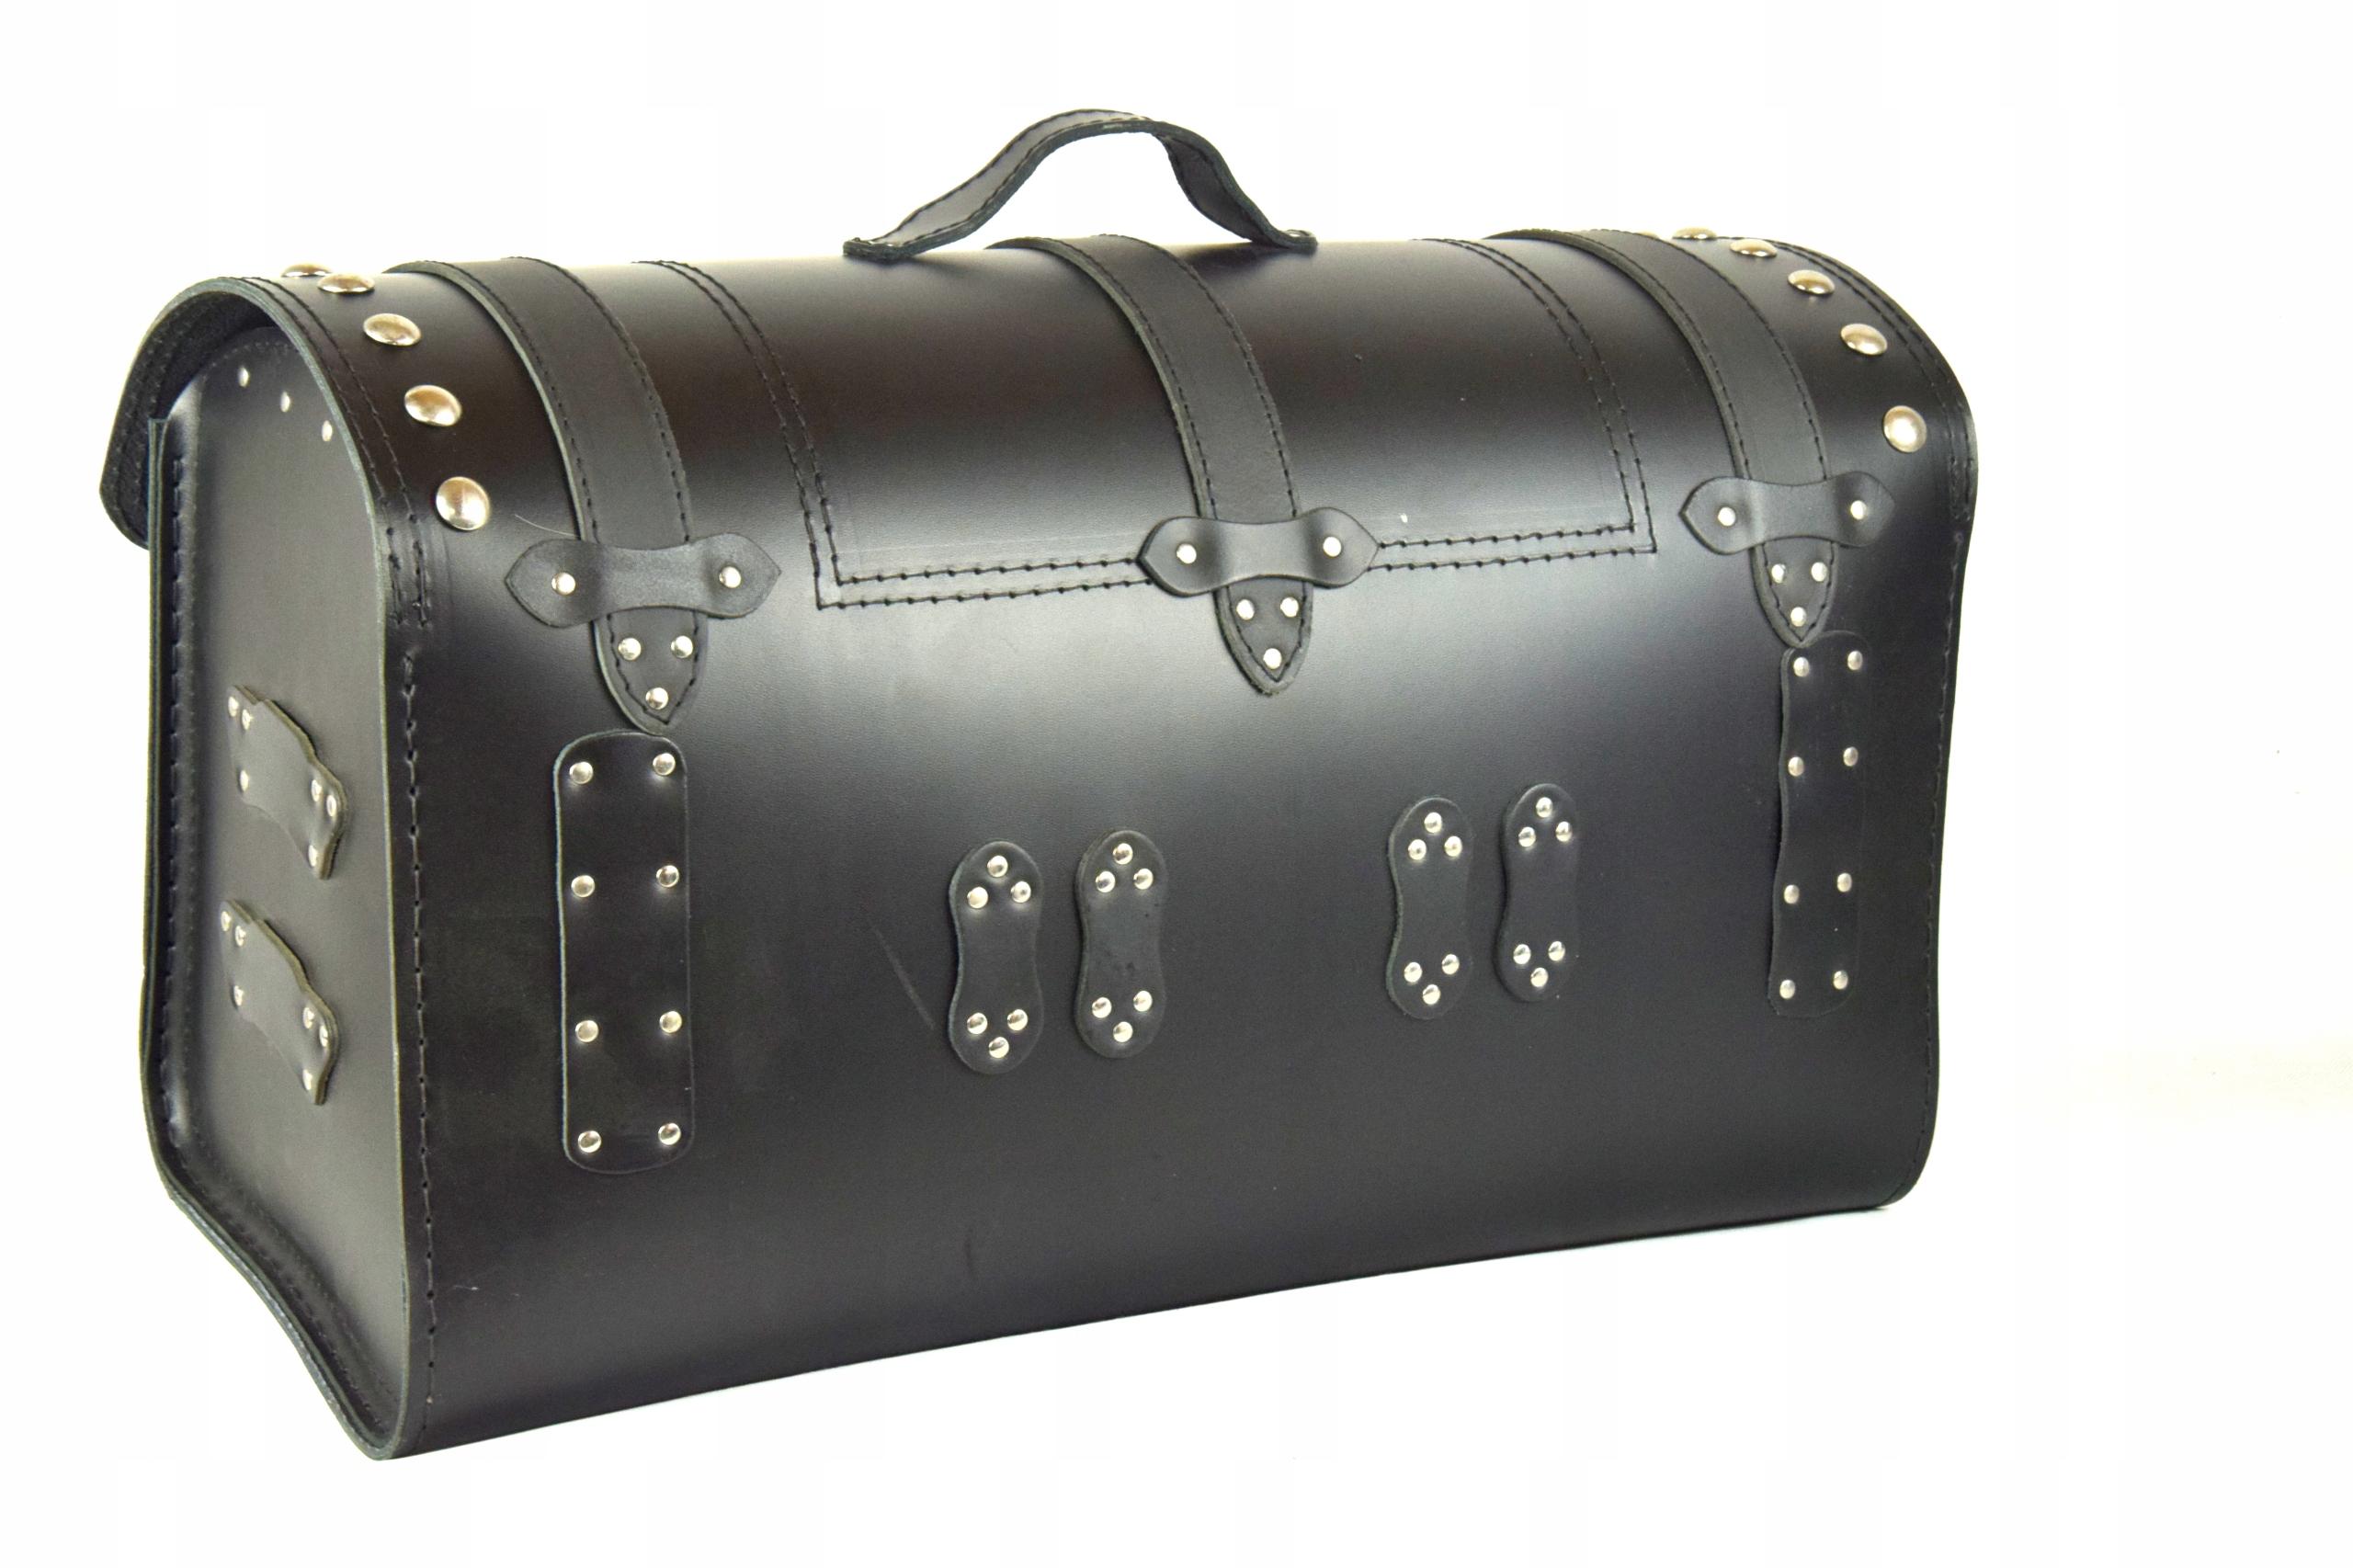 Kufer skórzany kufer tylni motocyklowy K181 Producent Inny